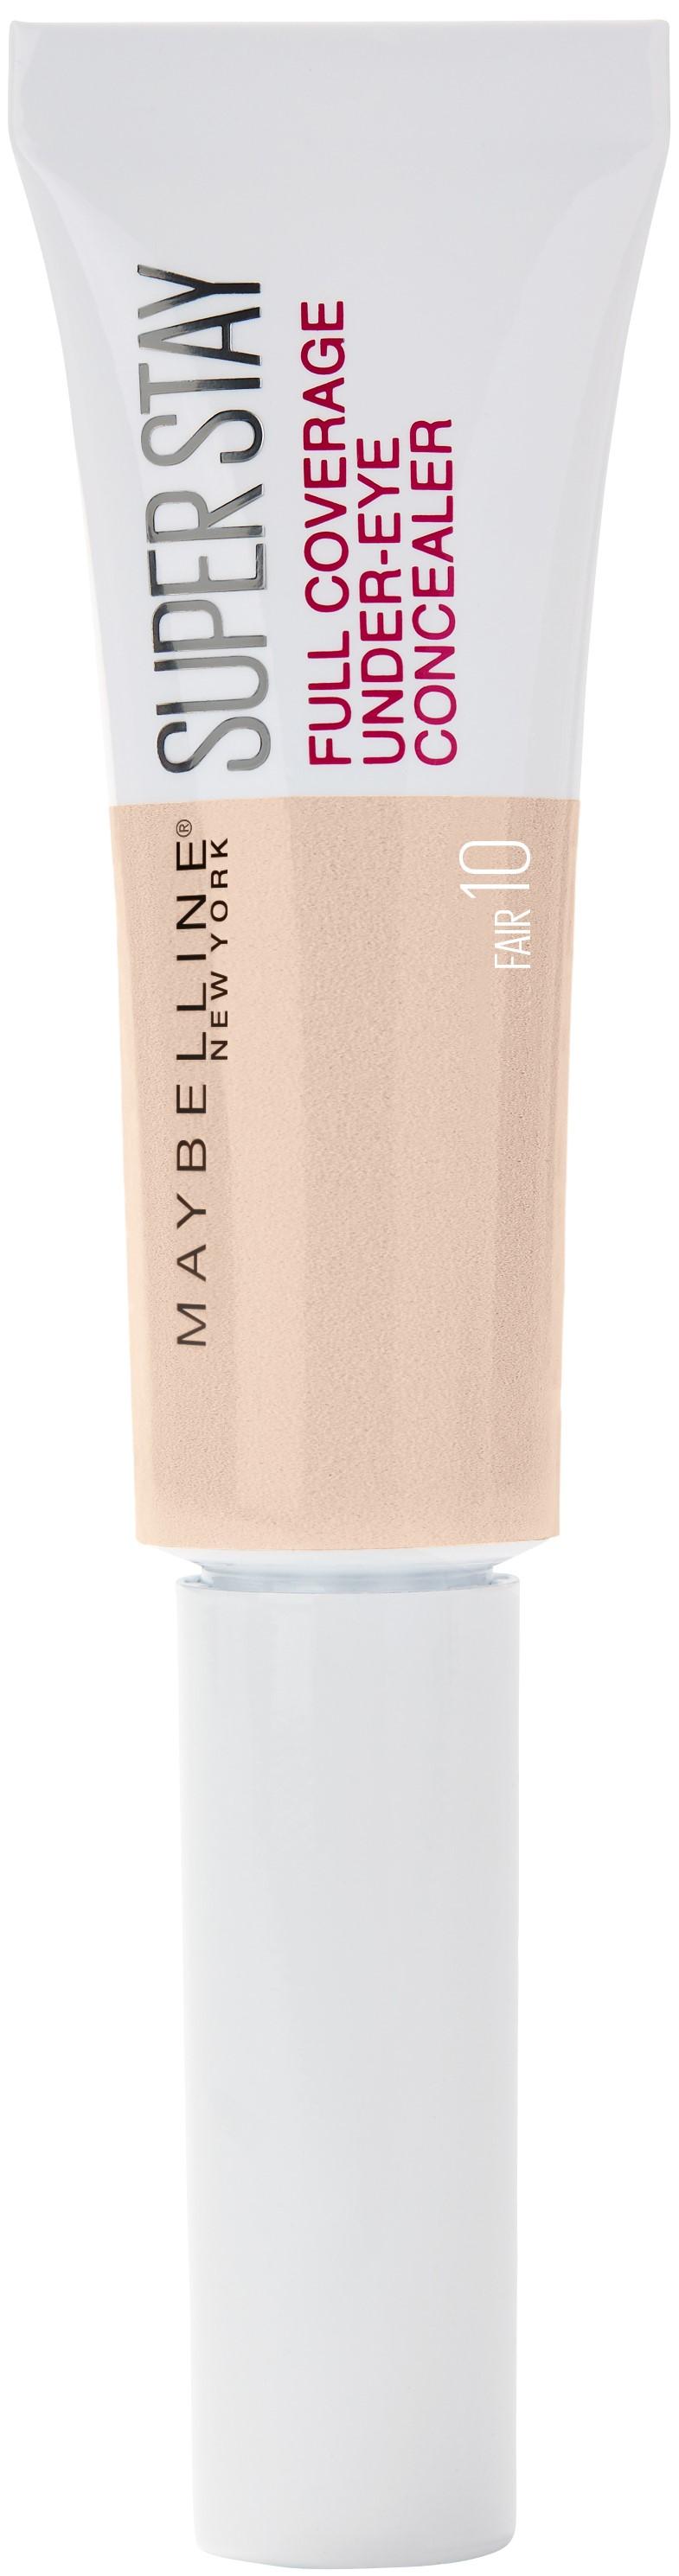 Maybelline - Superstay Full Coverage Under-Eye Concealer - 10 Fair